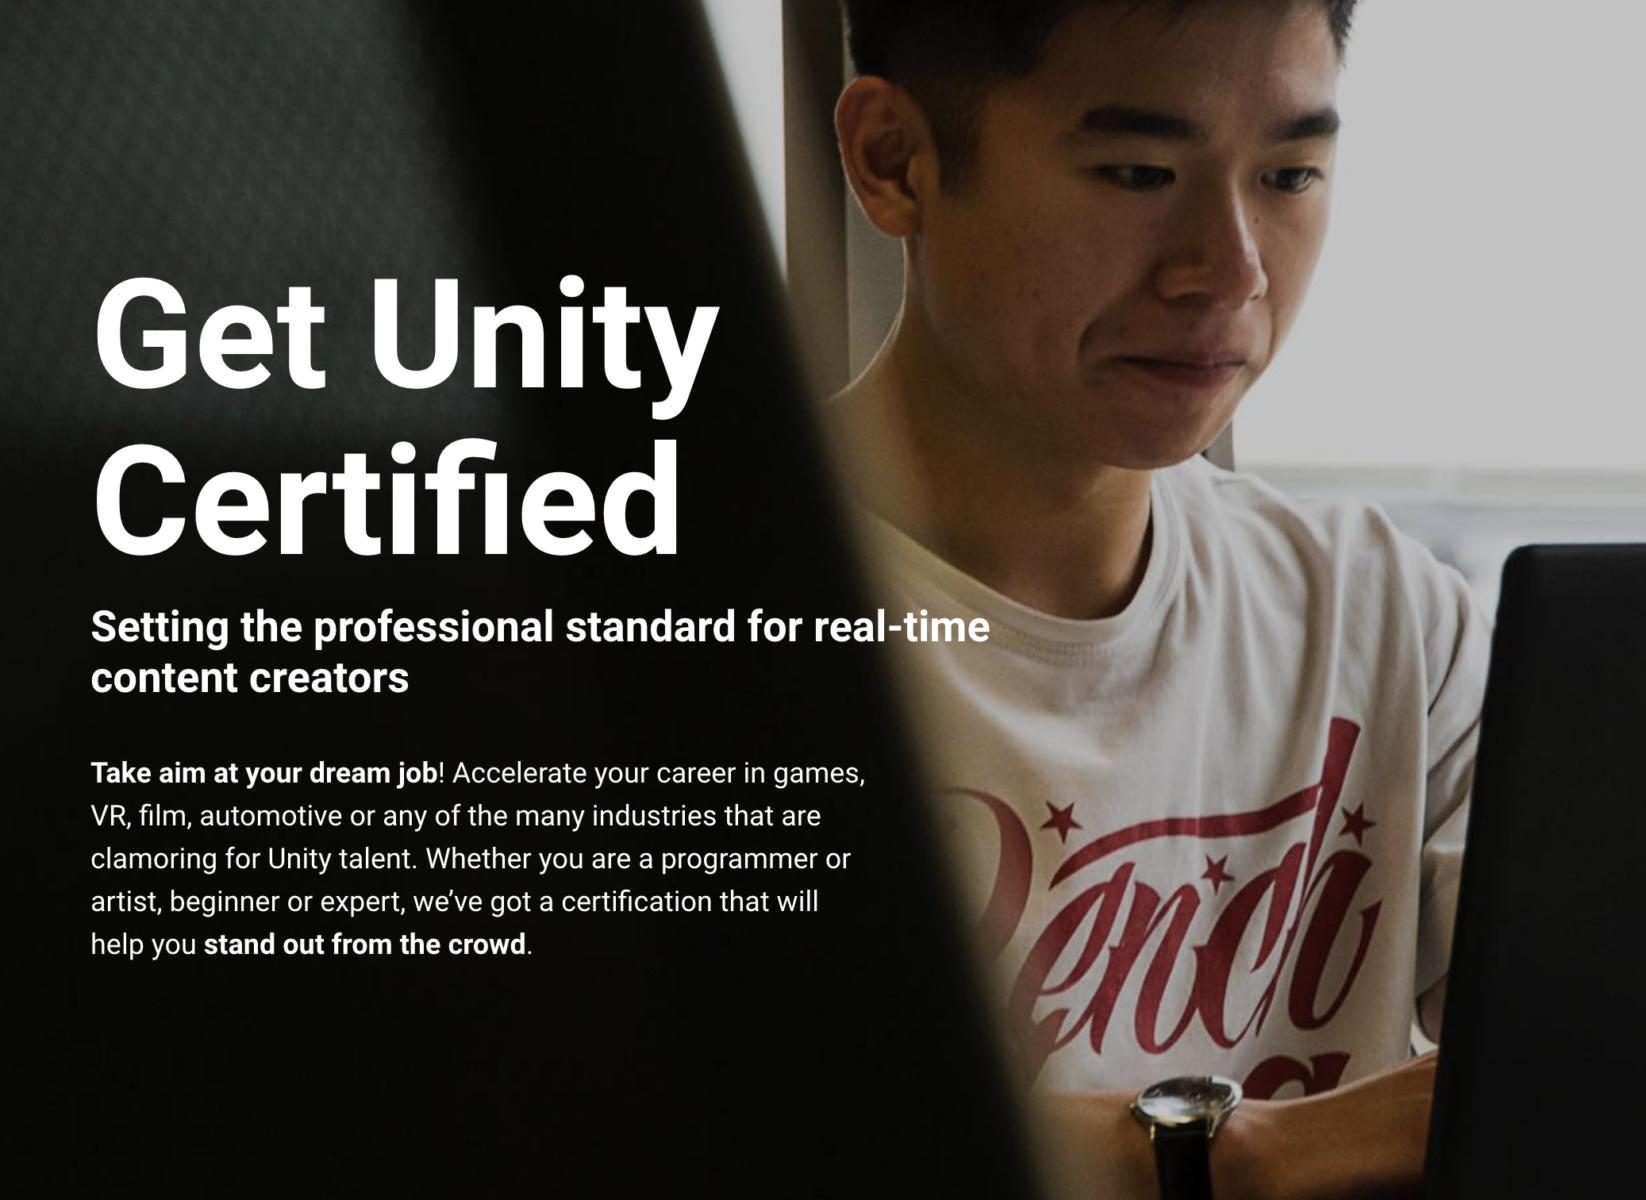 Get Unity Certified Thinkedu Corporate Website